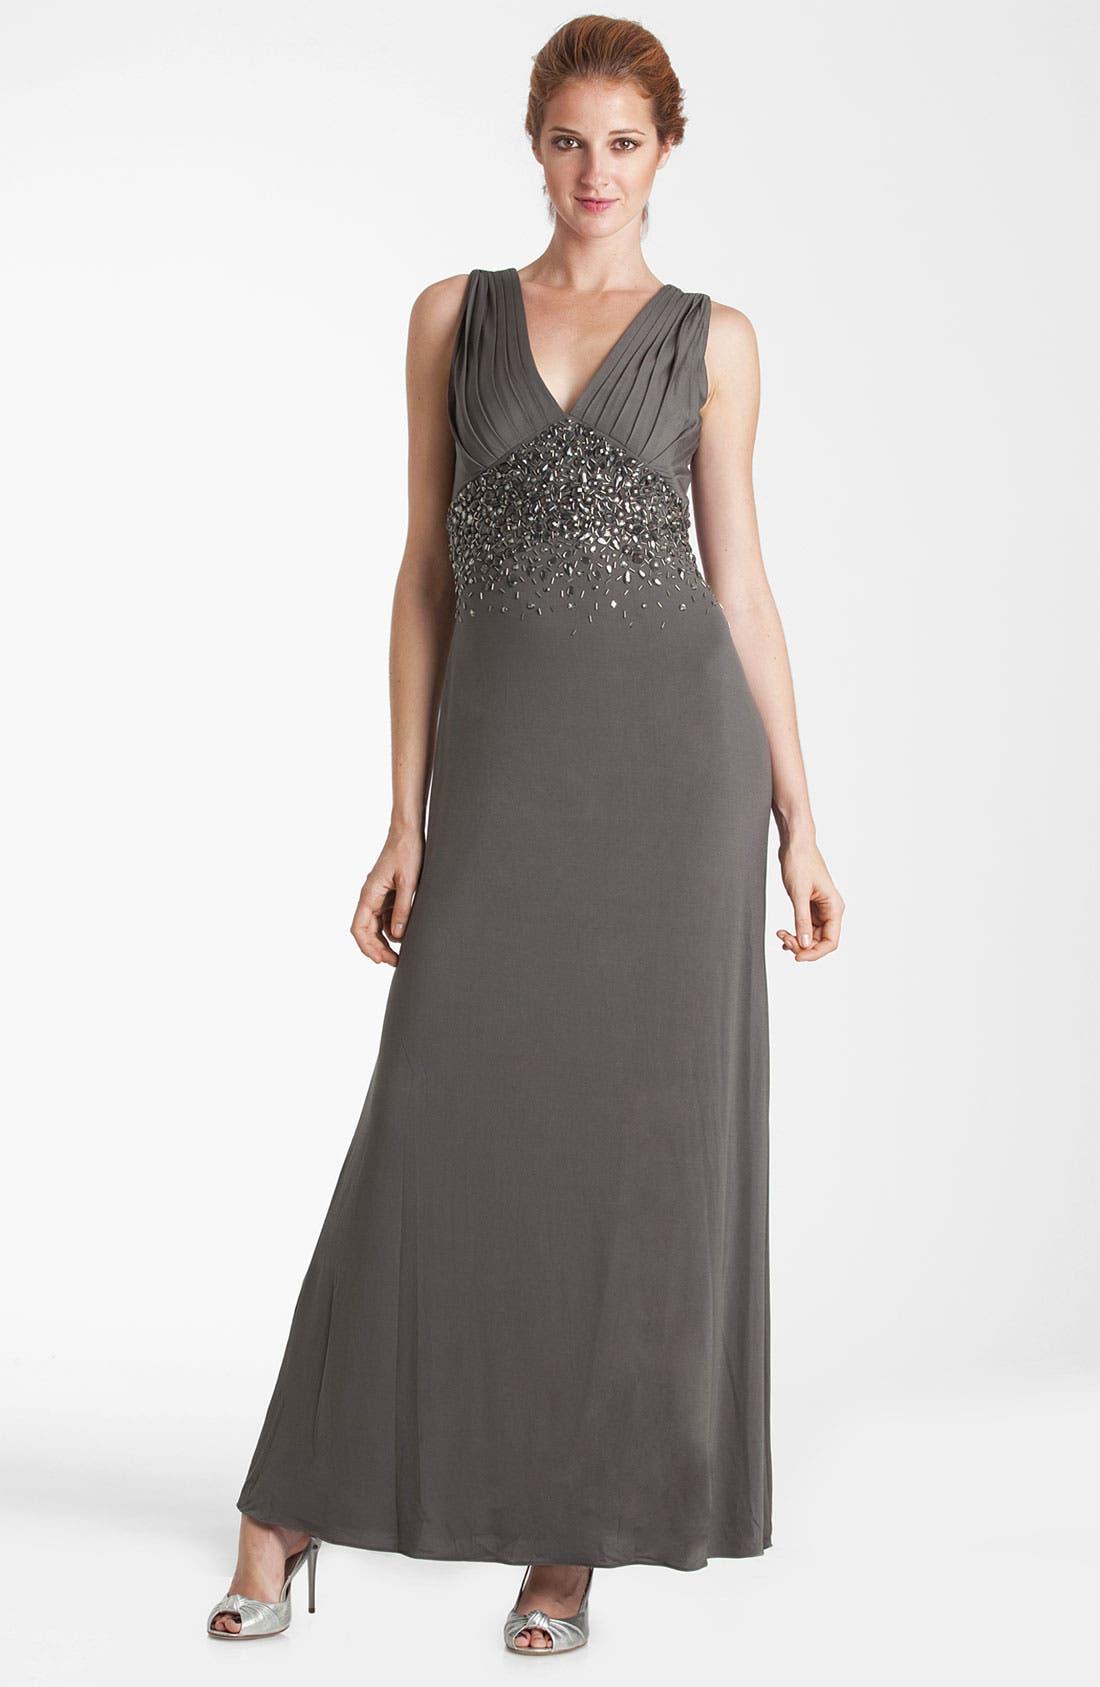 Alternate Image 1 Selected - JS Boutique Double-V Embellished Jersey Gown